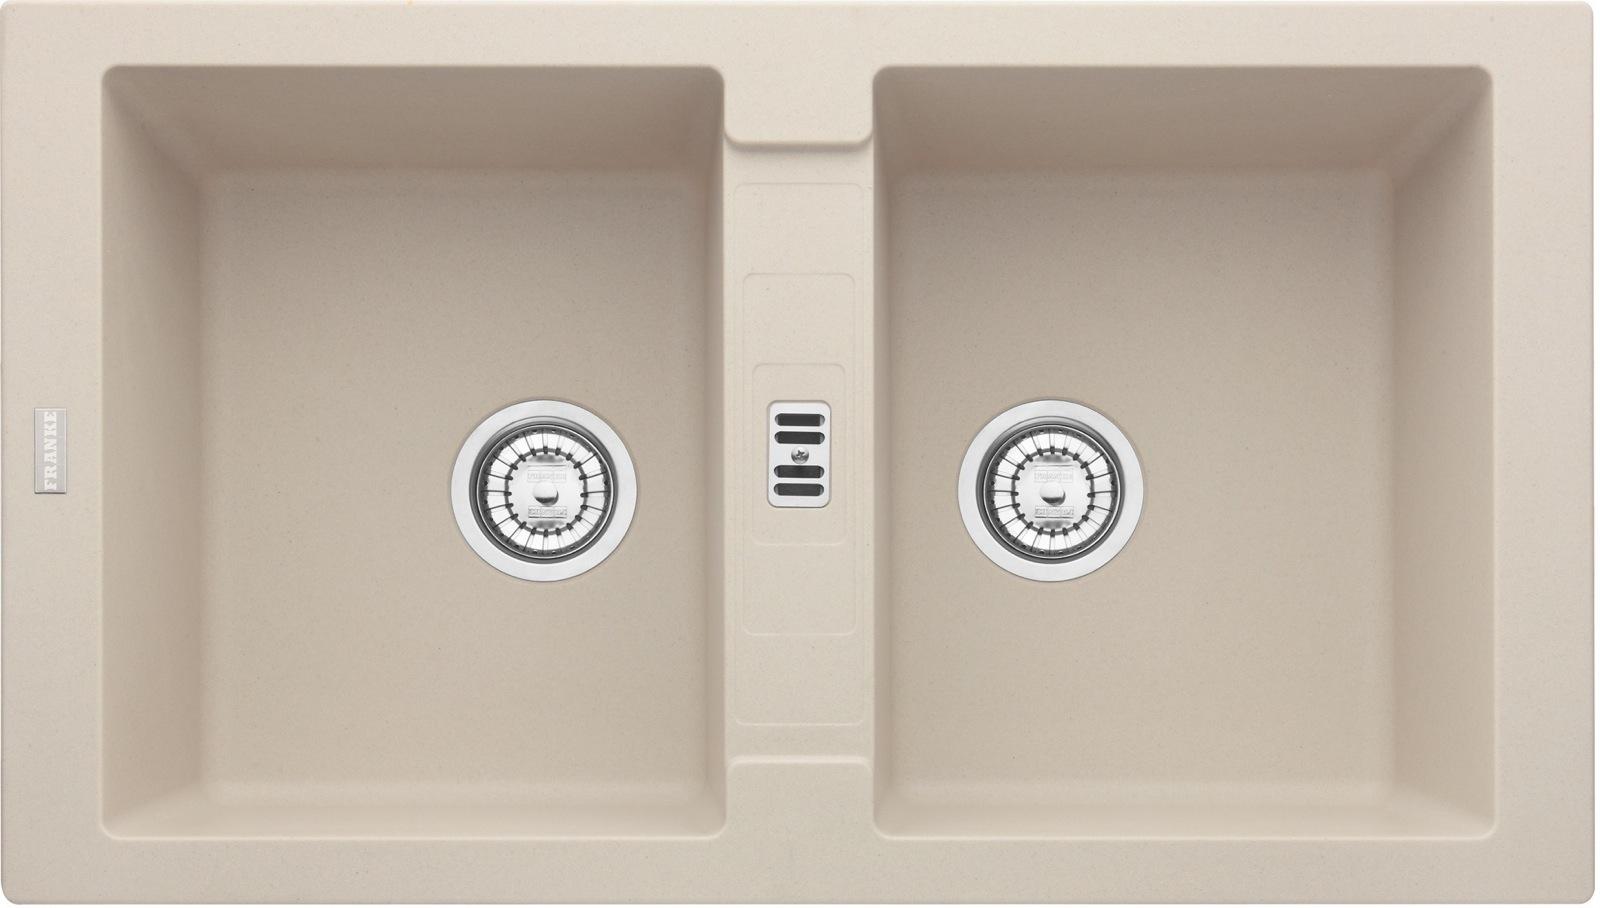 Chiuveta fragranite Franke Maris MRG 620 reversibila 860x500 tehnologie Sanitized Sahara